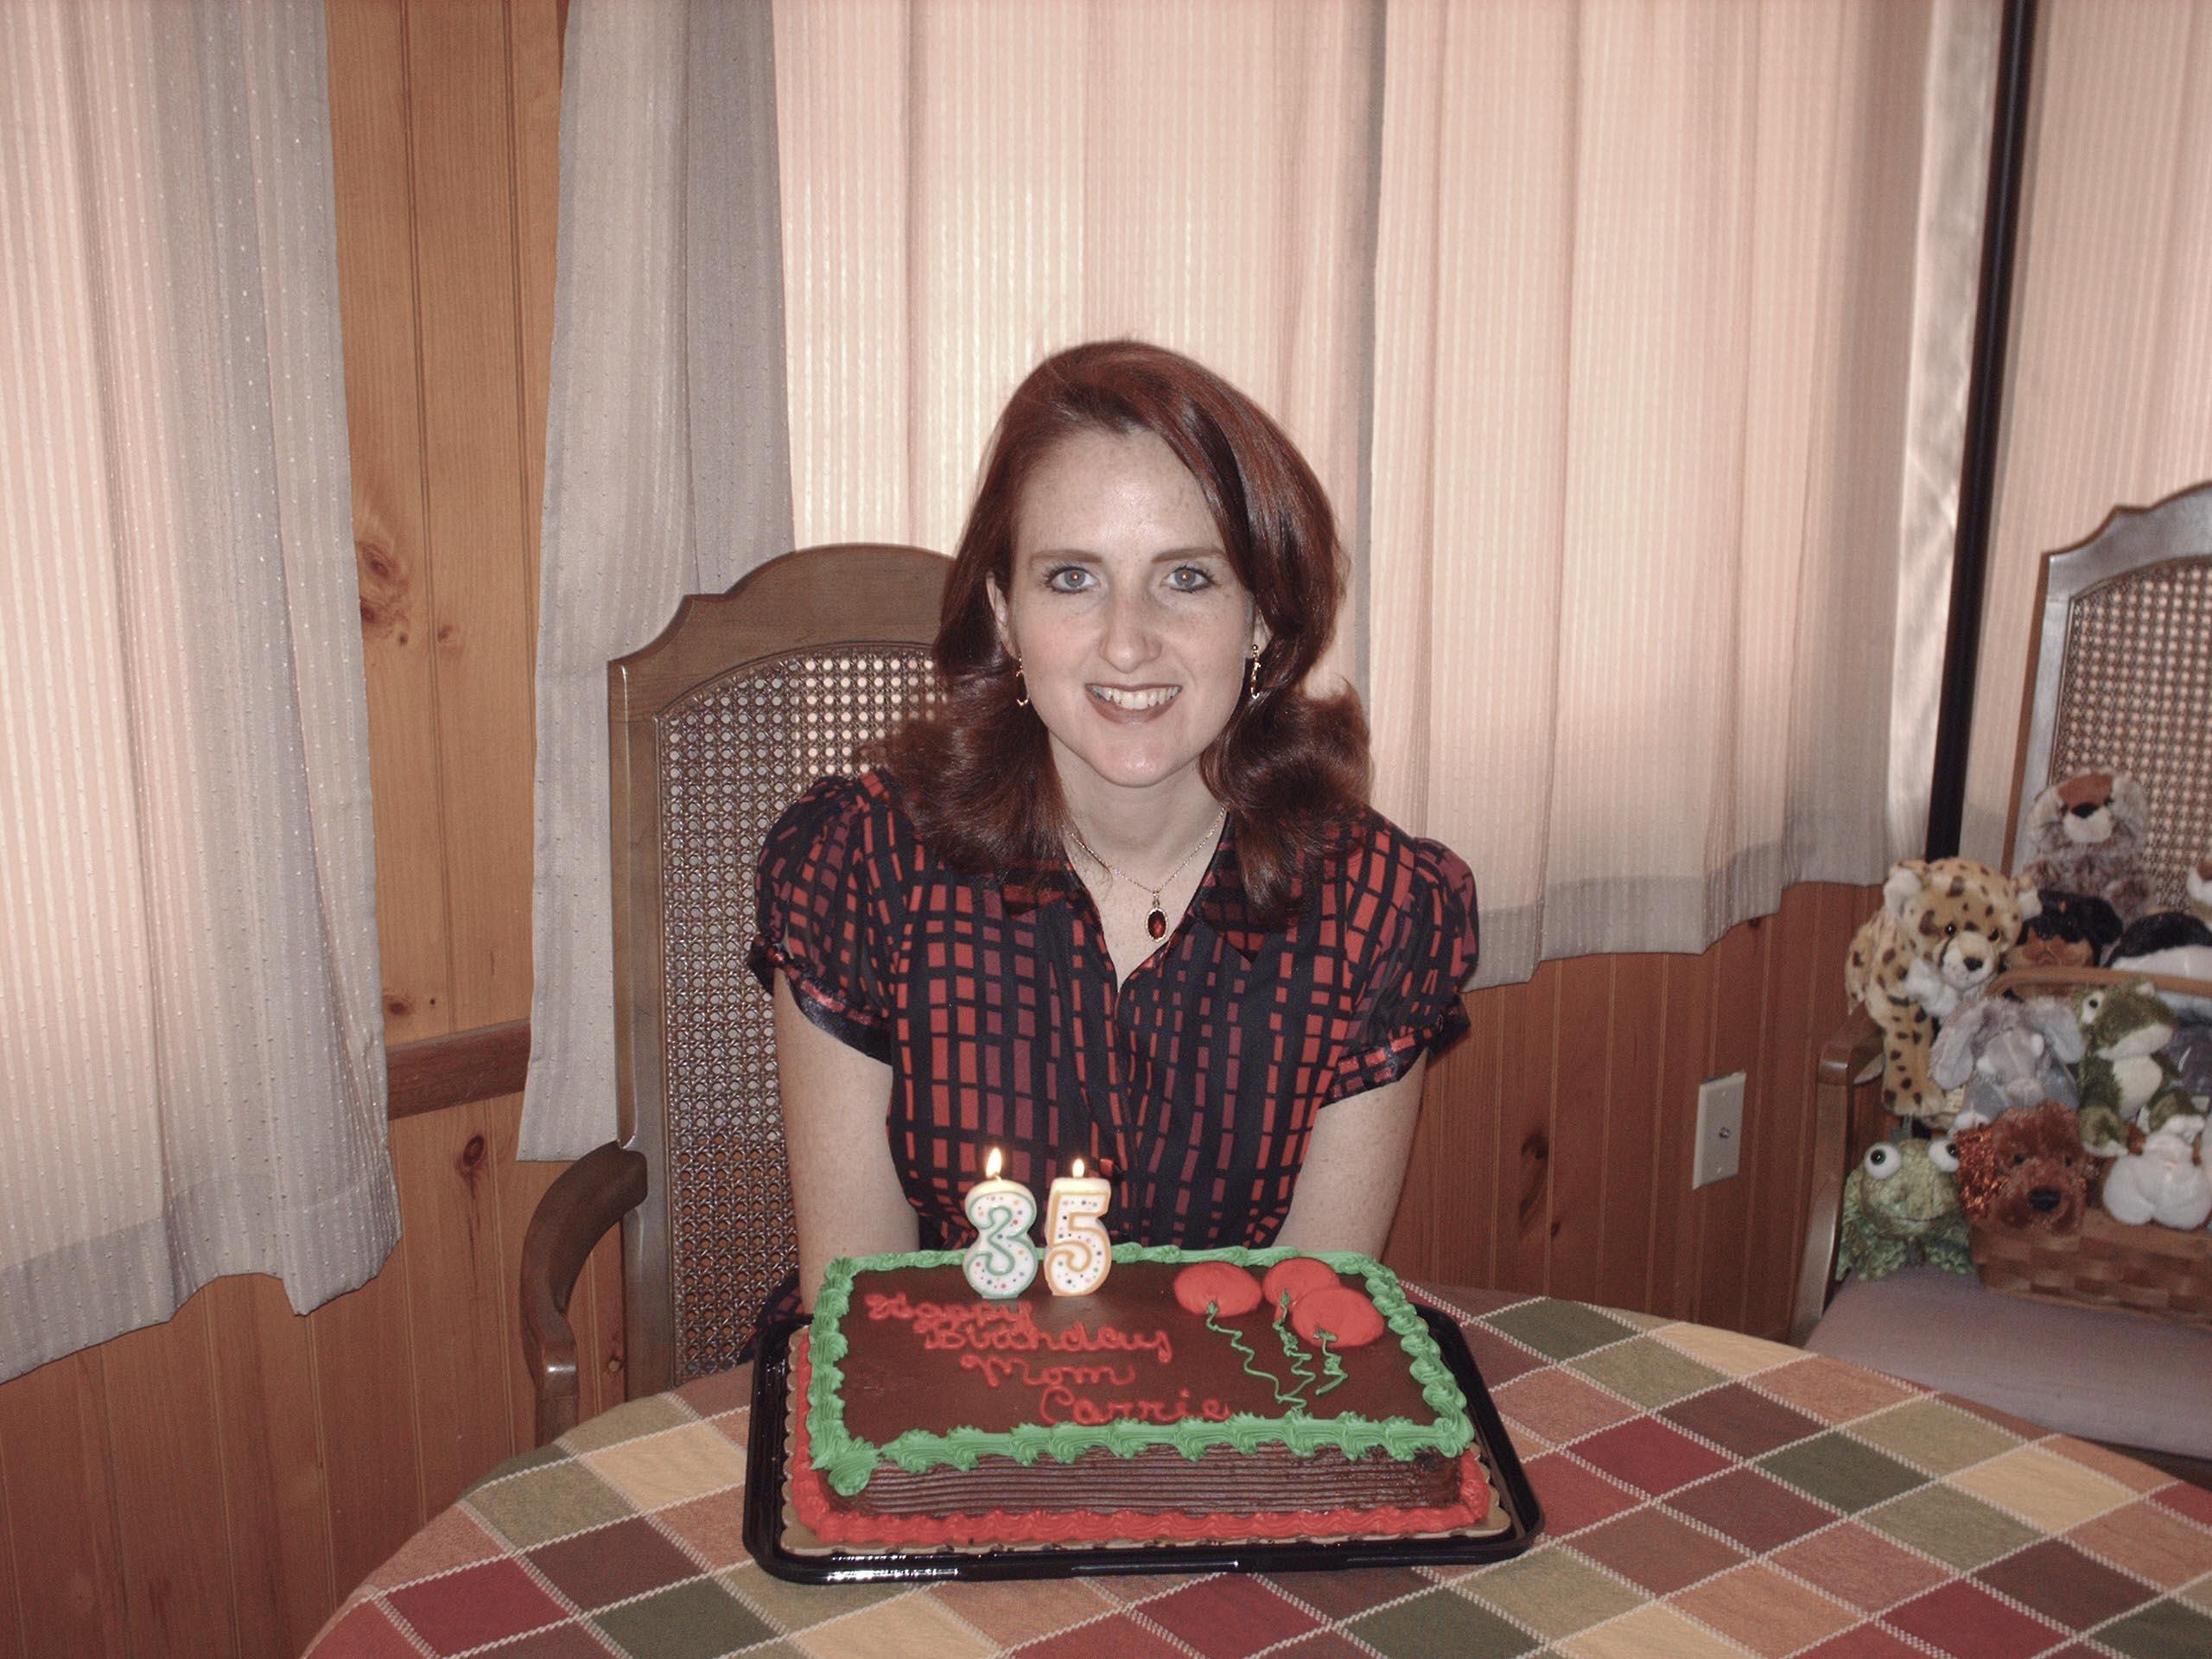 Carrie Birthday